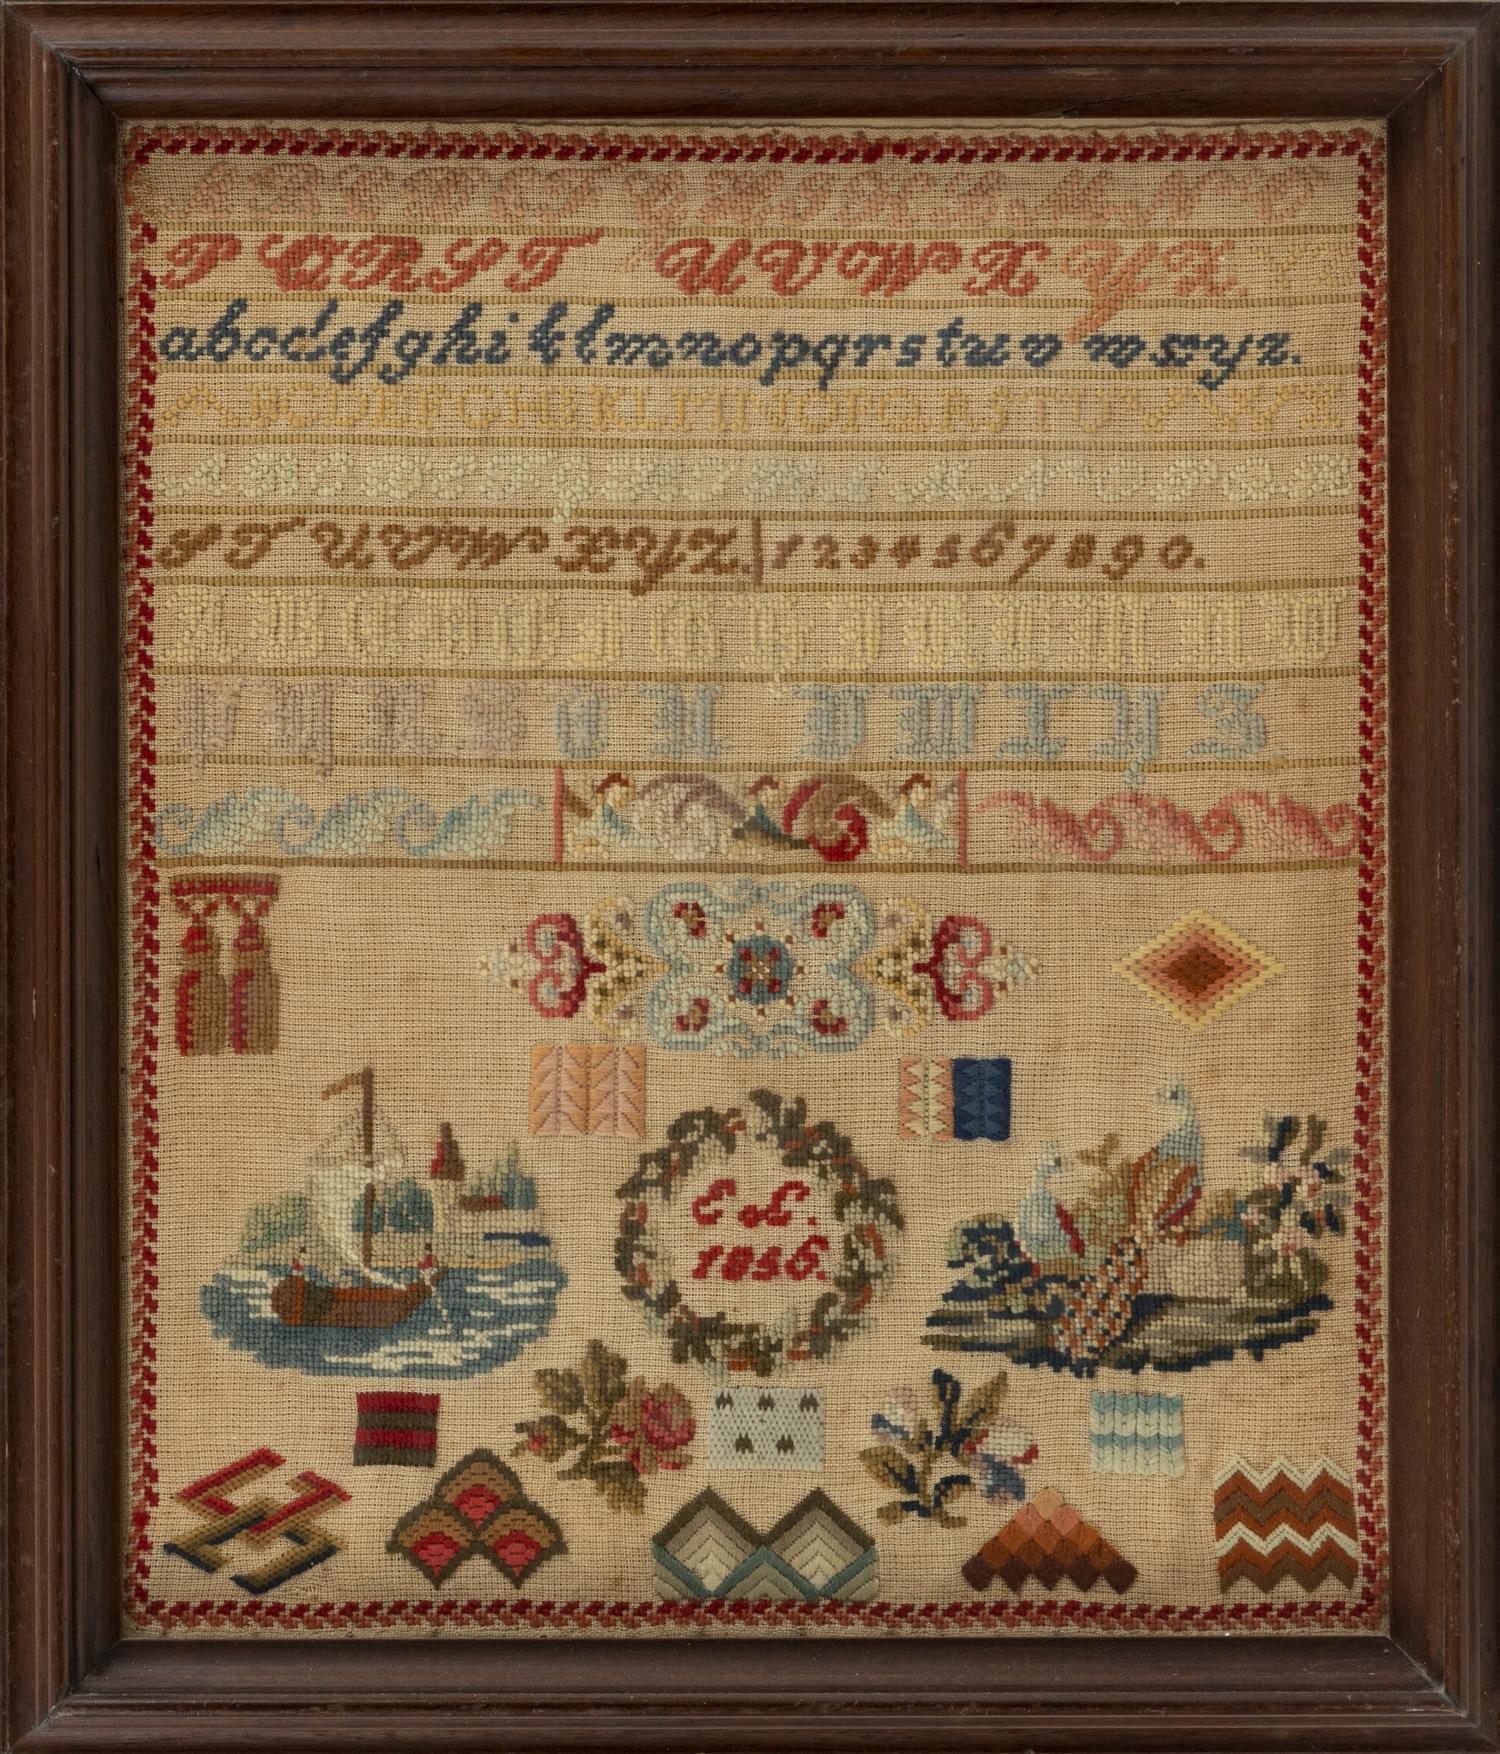 "ENGLISH NEEDLEWORK SAMPLER Dated 1856. Sailboat and peafowl design. Framed 19.5"" x 17""."